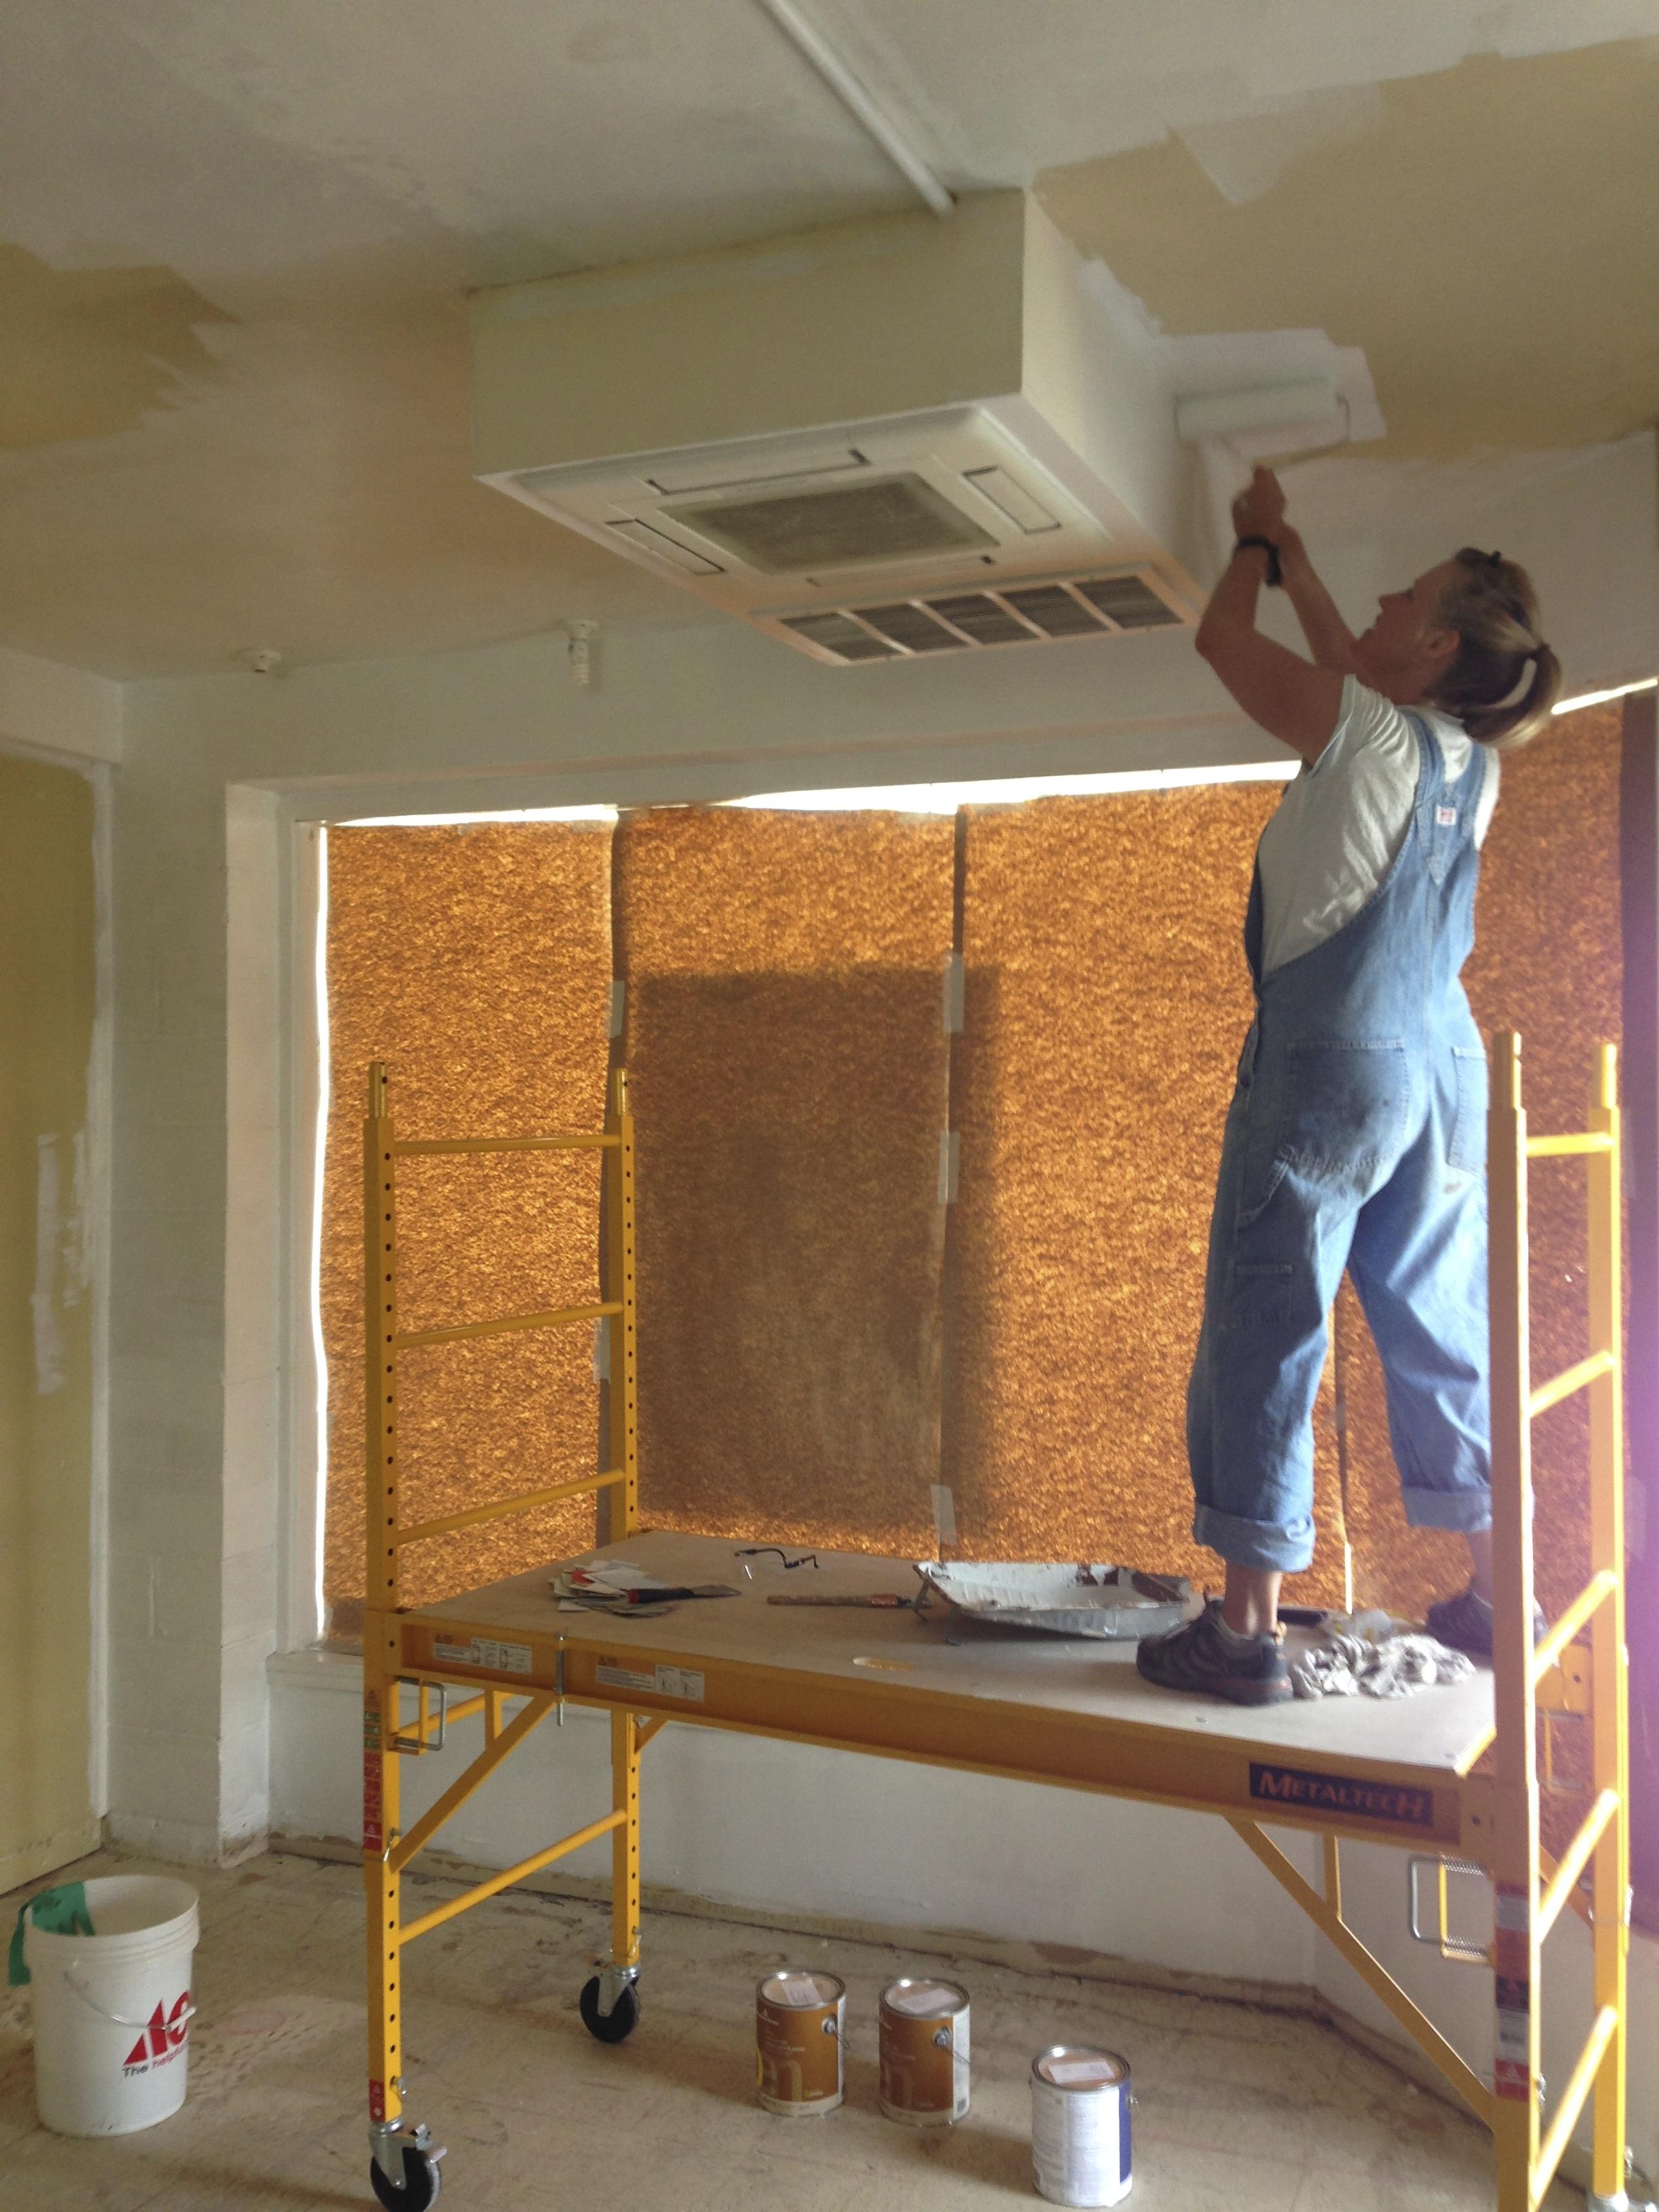 Monacan shop ceiling in progress